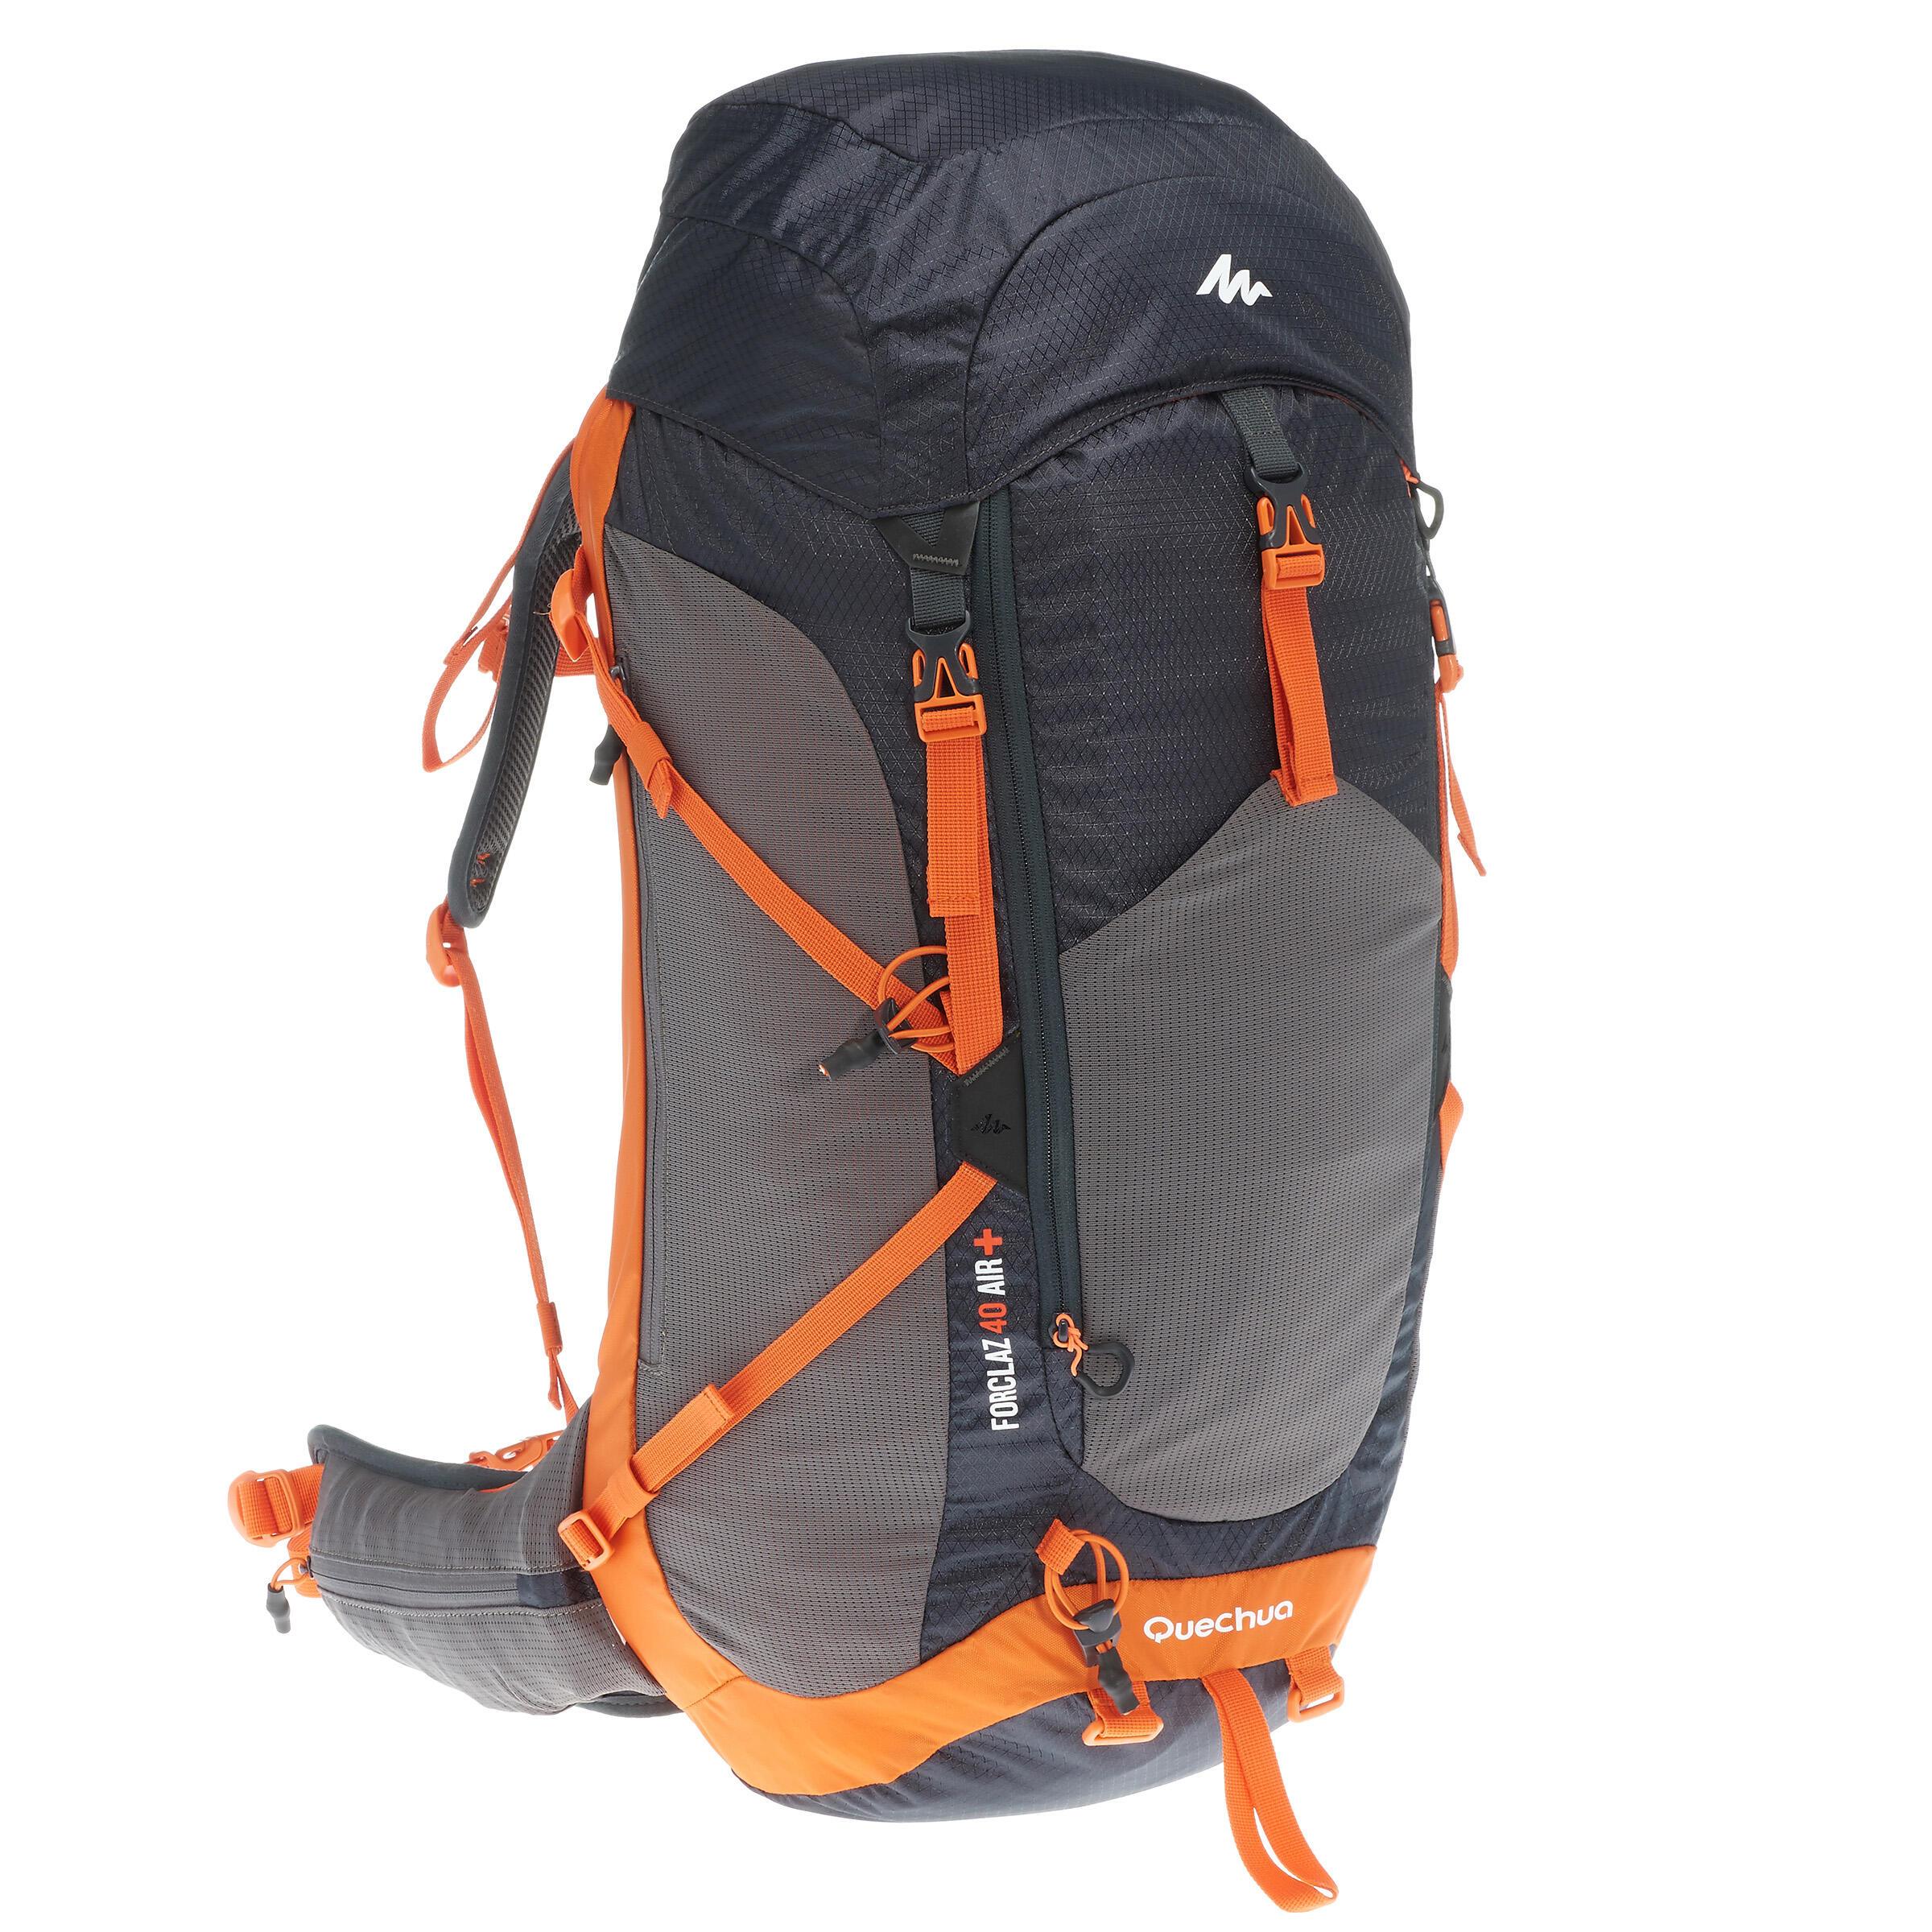 7f7dafbb530 Quechua Wandelrugzak MH500 40 liter zwart/oranje | Decathlon